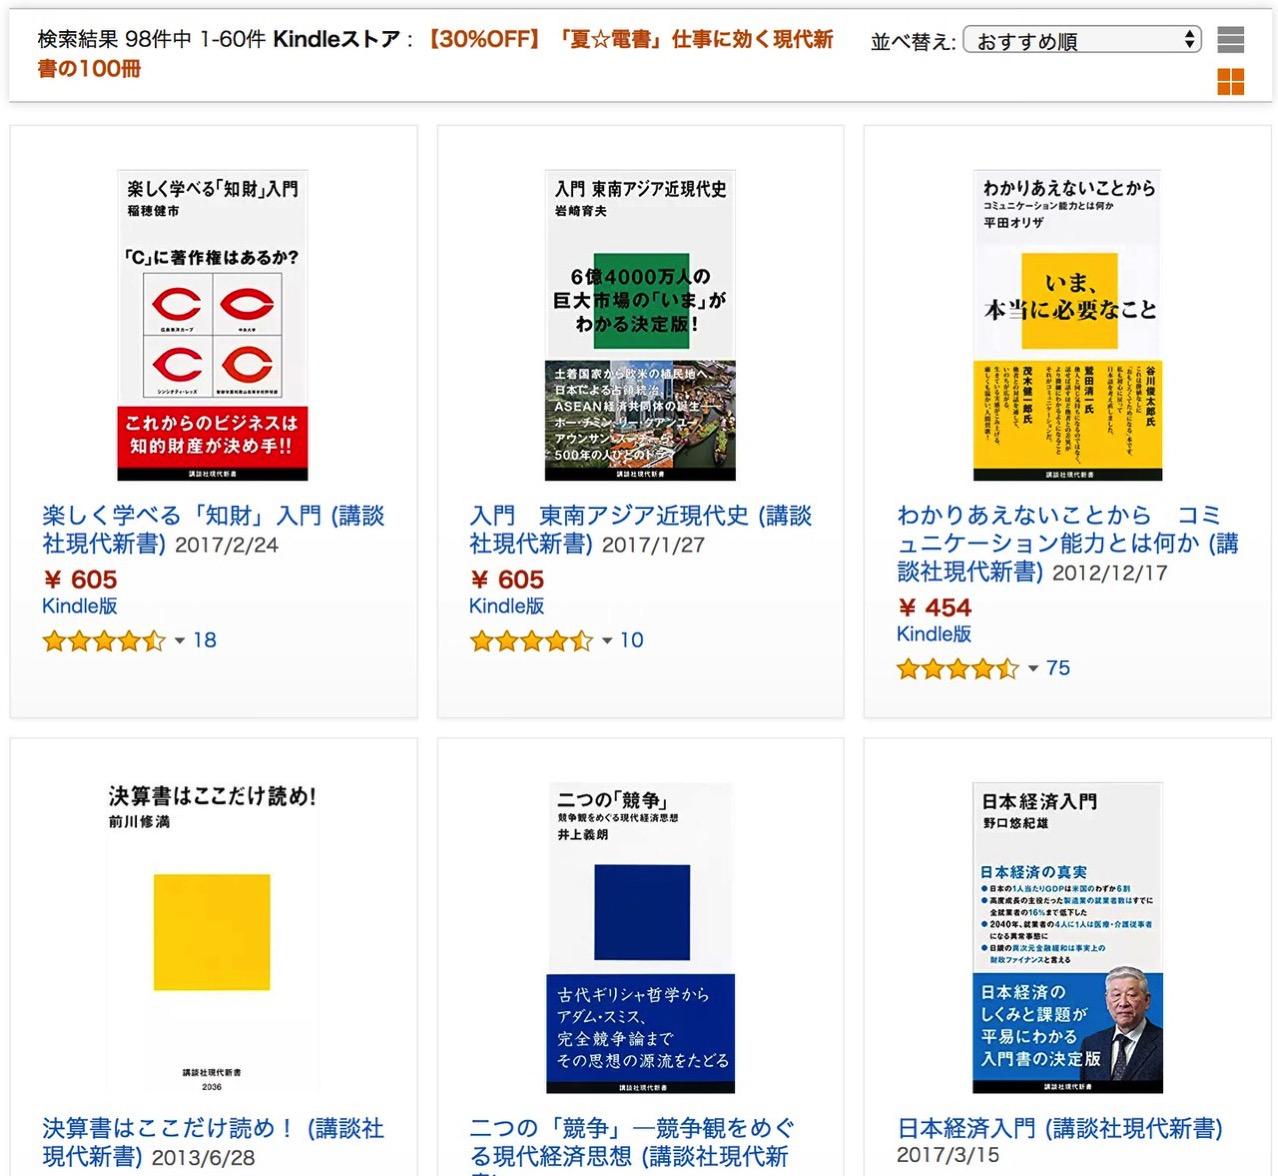 【Kindleセール】30%オフ「夏☆電書」仕事に効く現代新書の100冊